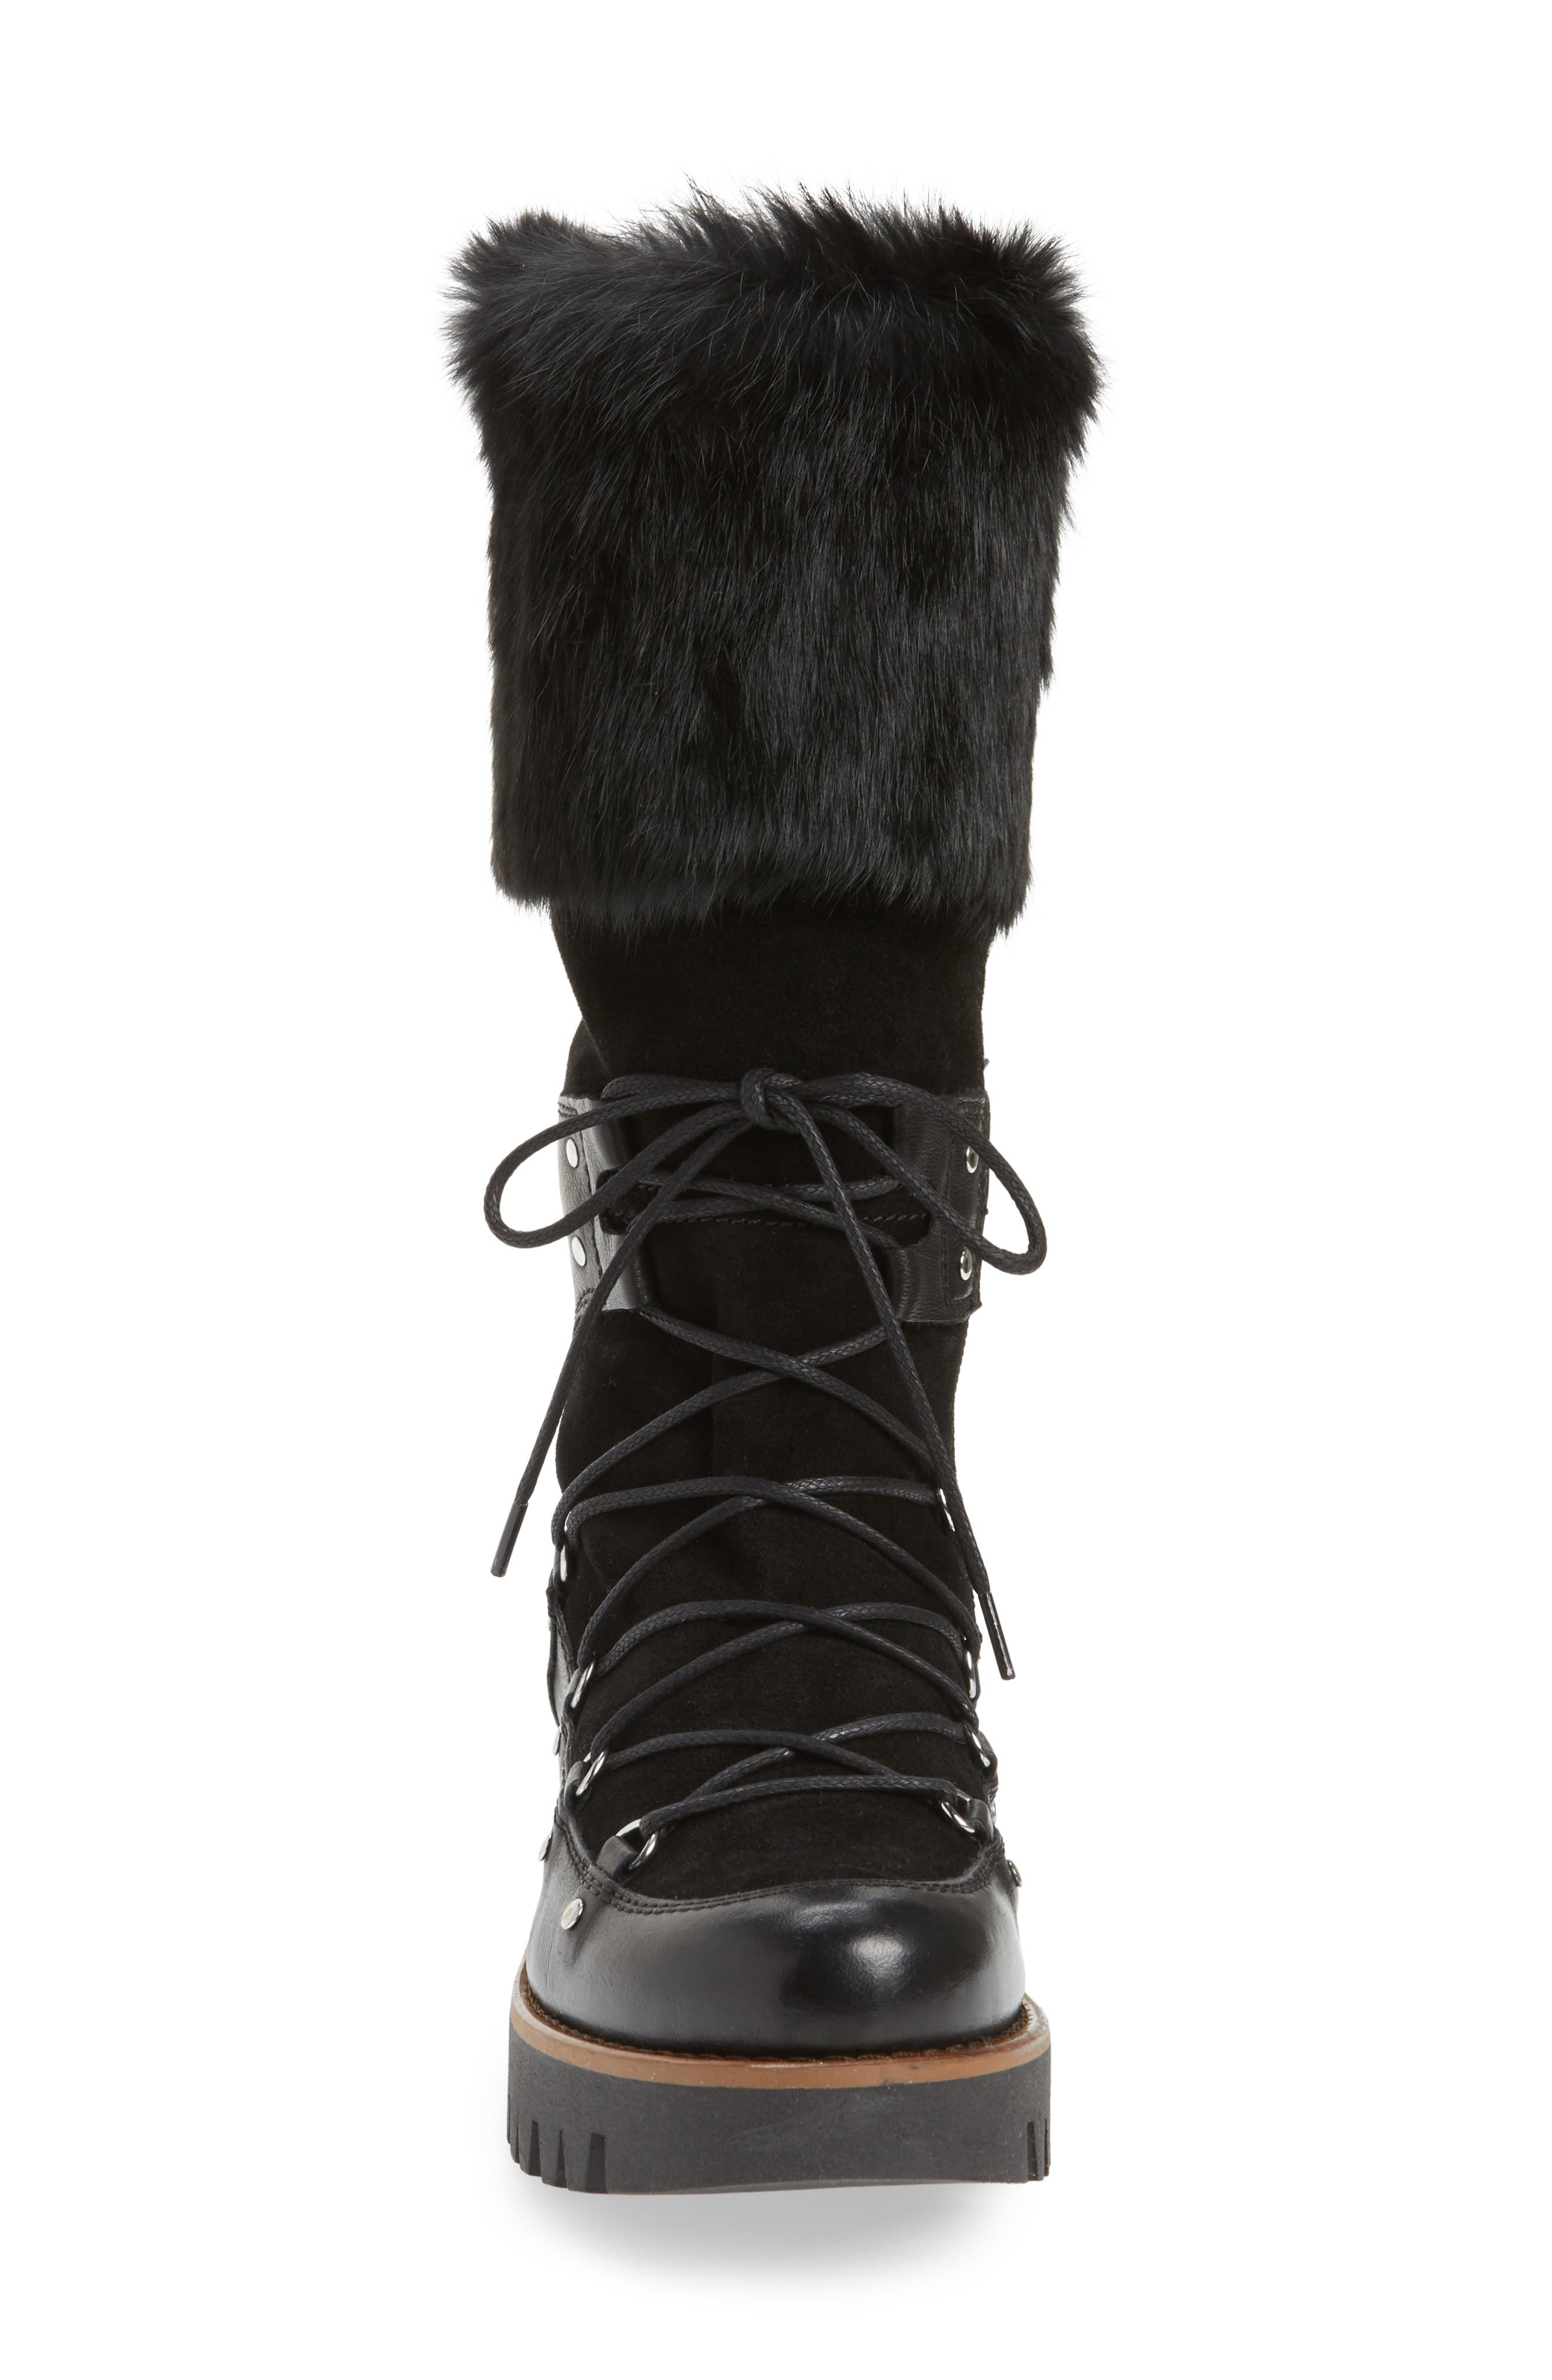 Tellurian Genuine Rabbit Fur Cuff Boot,                             Alternate thumbnail 4, color,                             Black Leather